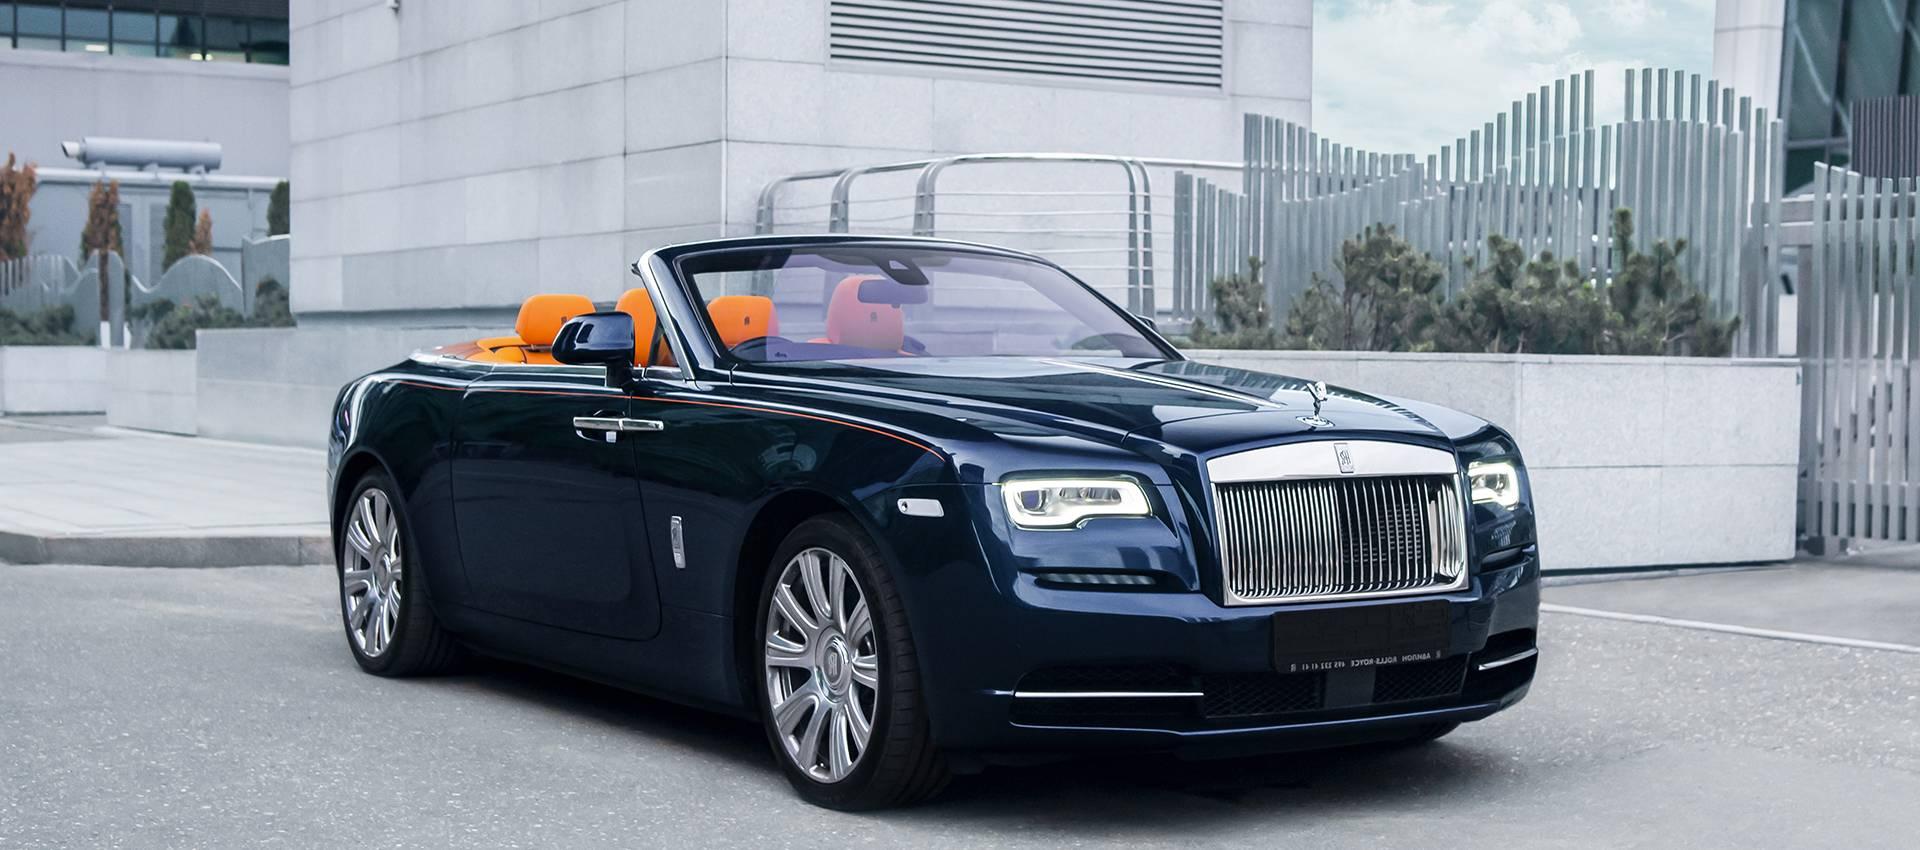 Аренда Rolls-Royce Dawn в Москве